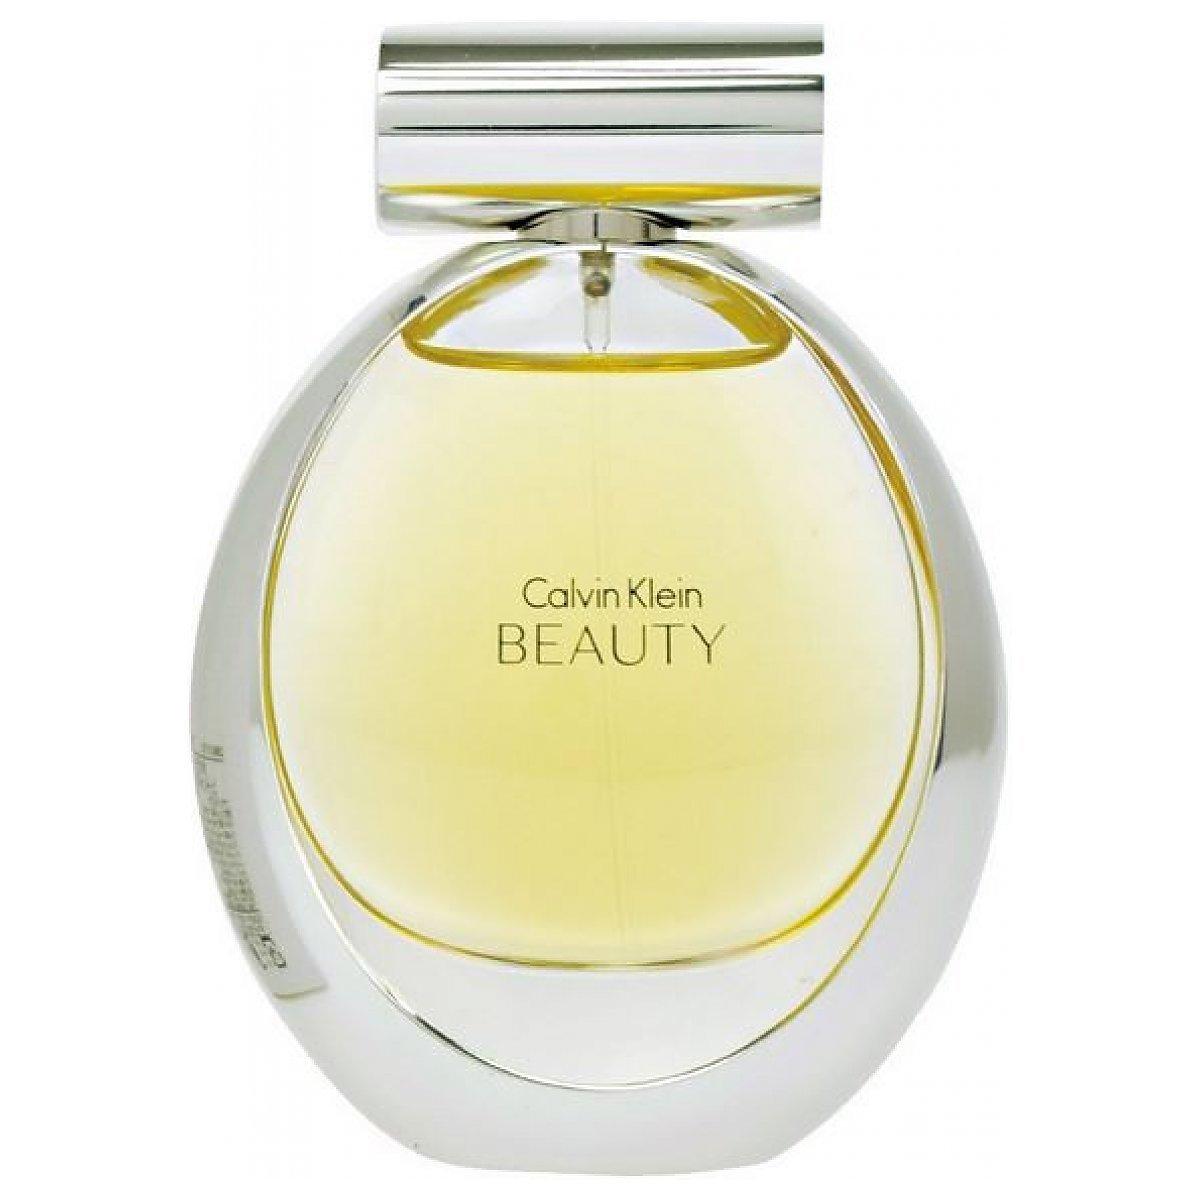 calvin klein beauty woda perfumowana spray 30ml perfumeria. Black Bedroom Furniture Sets. Home Design Ideas